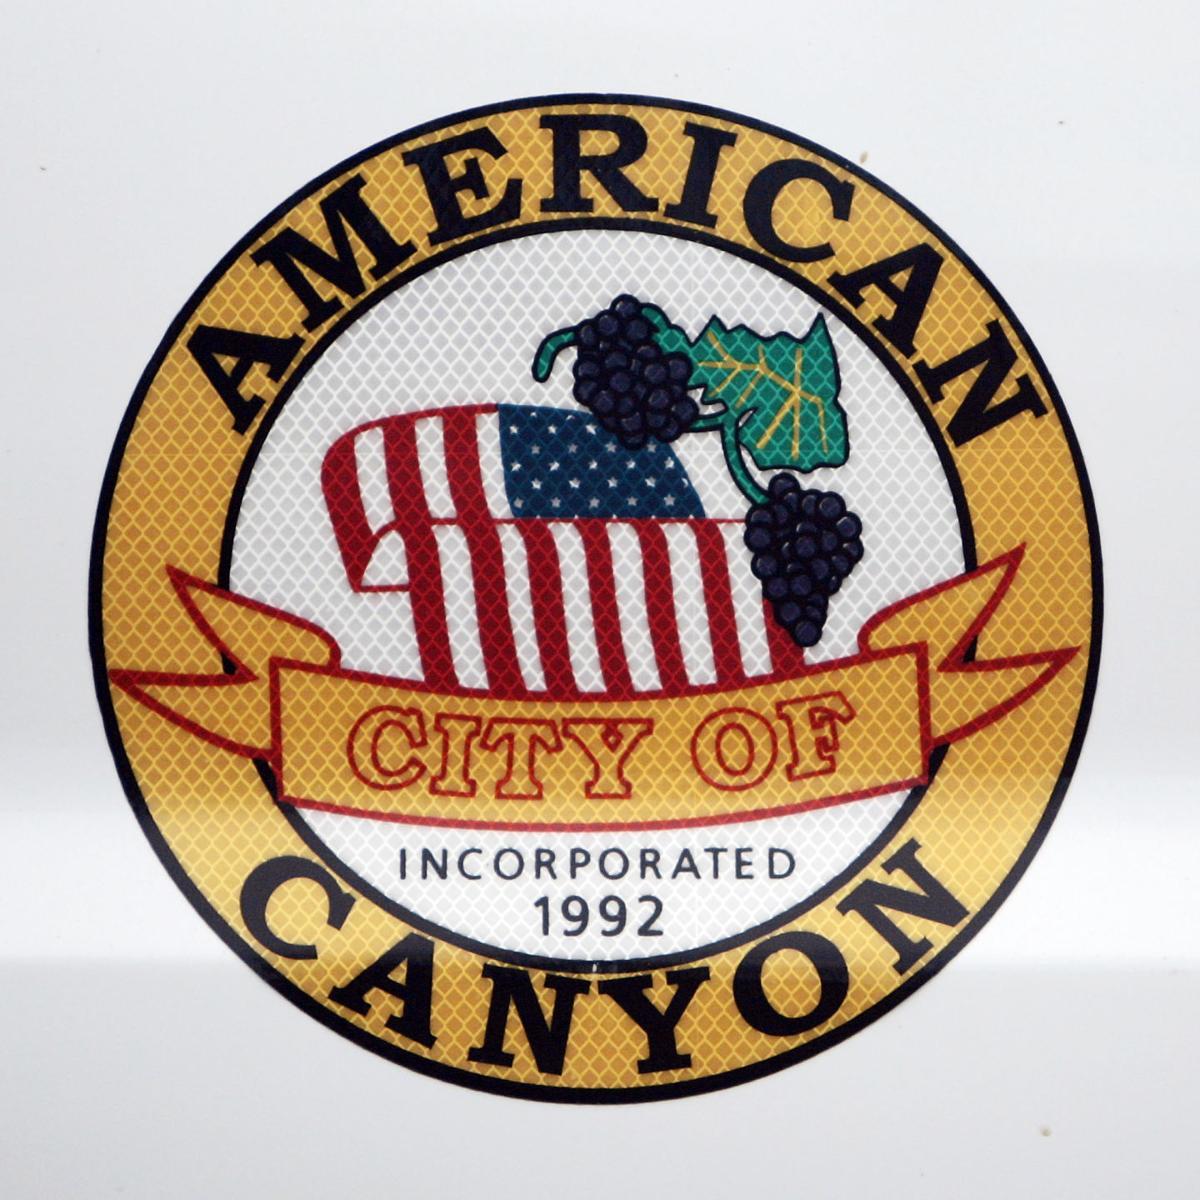 City of American Canyon Logo